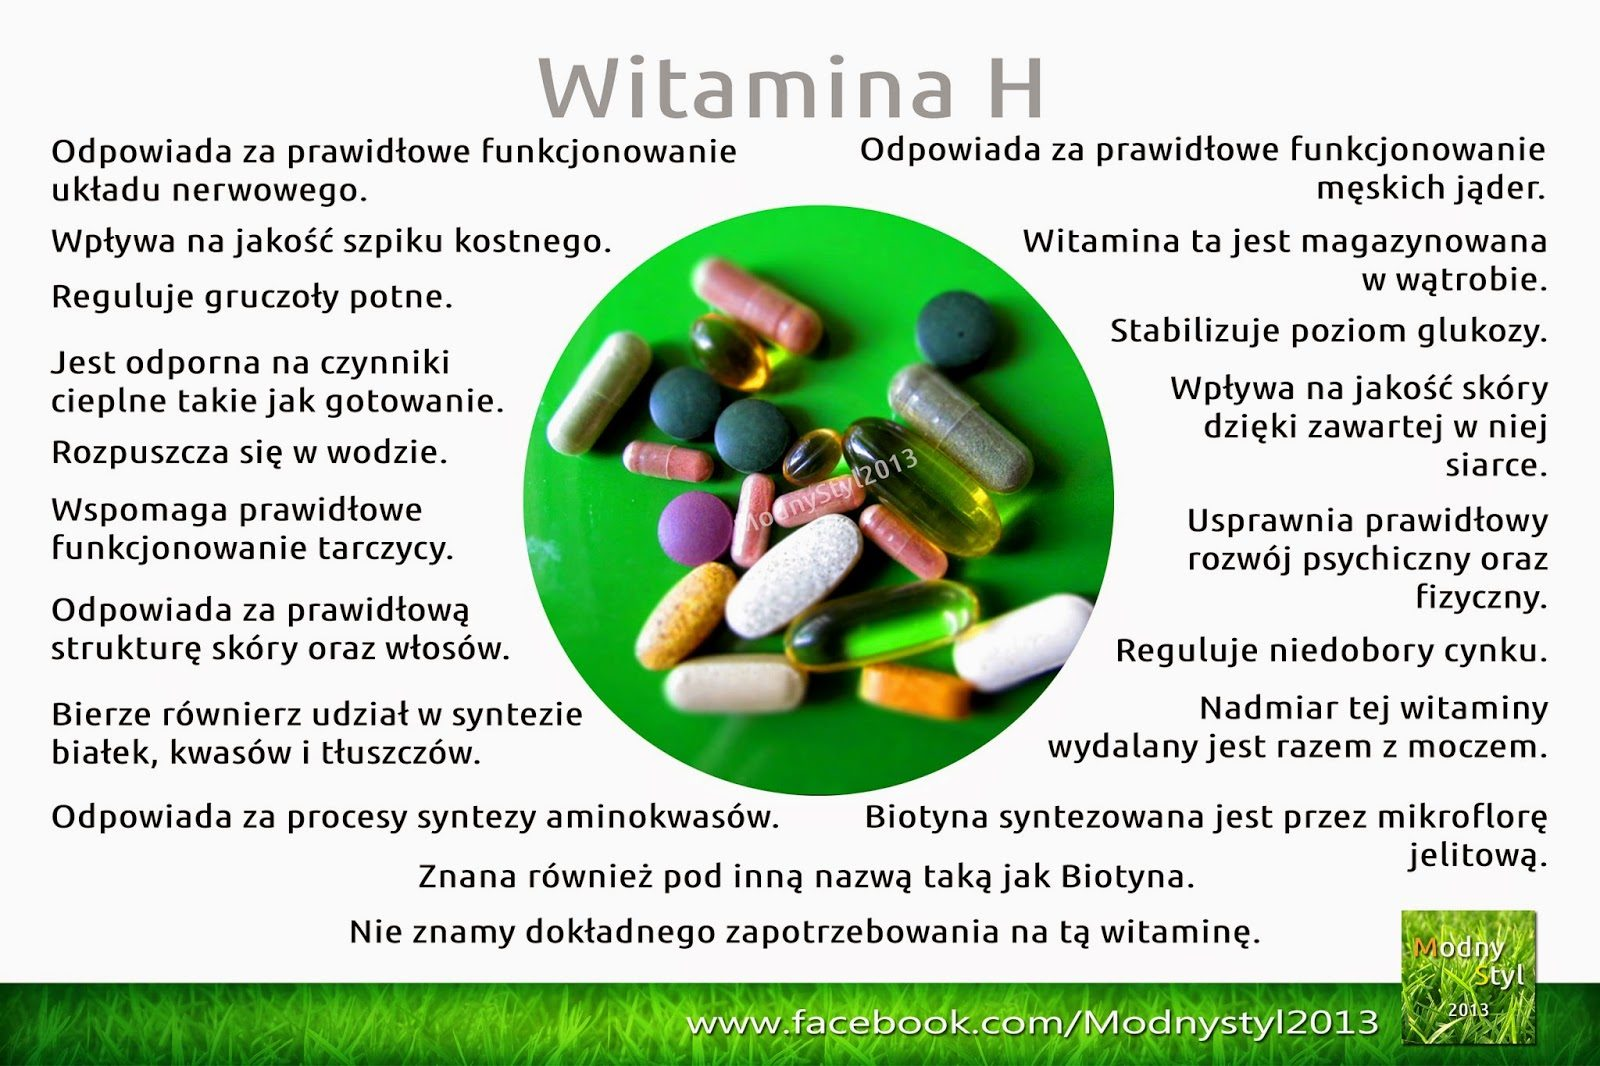 witamina2bh-6773591